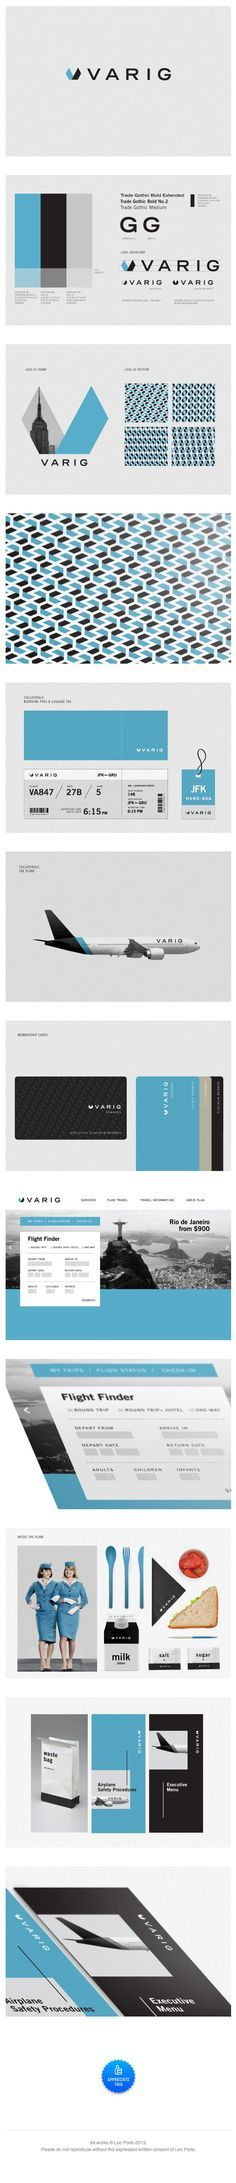 50+ Brand Identity Design Examples That ImpressiShareArena | Creative Hub